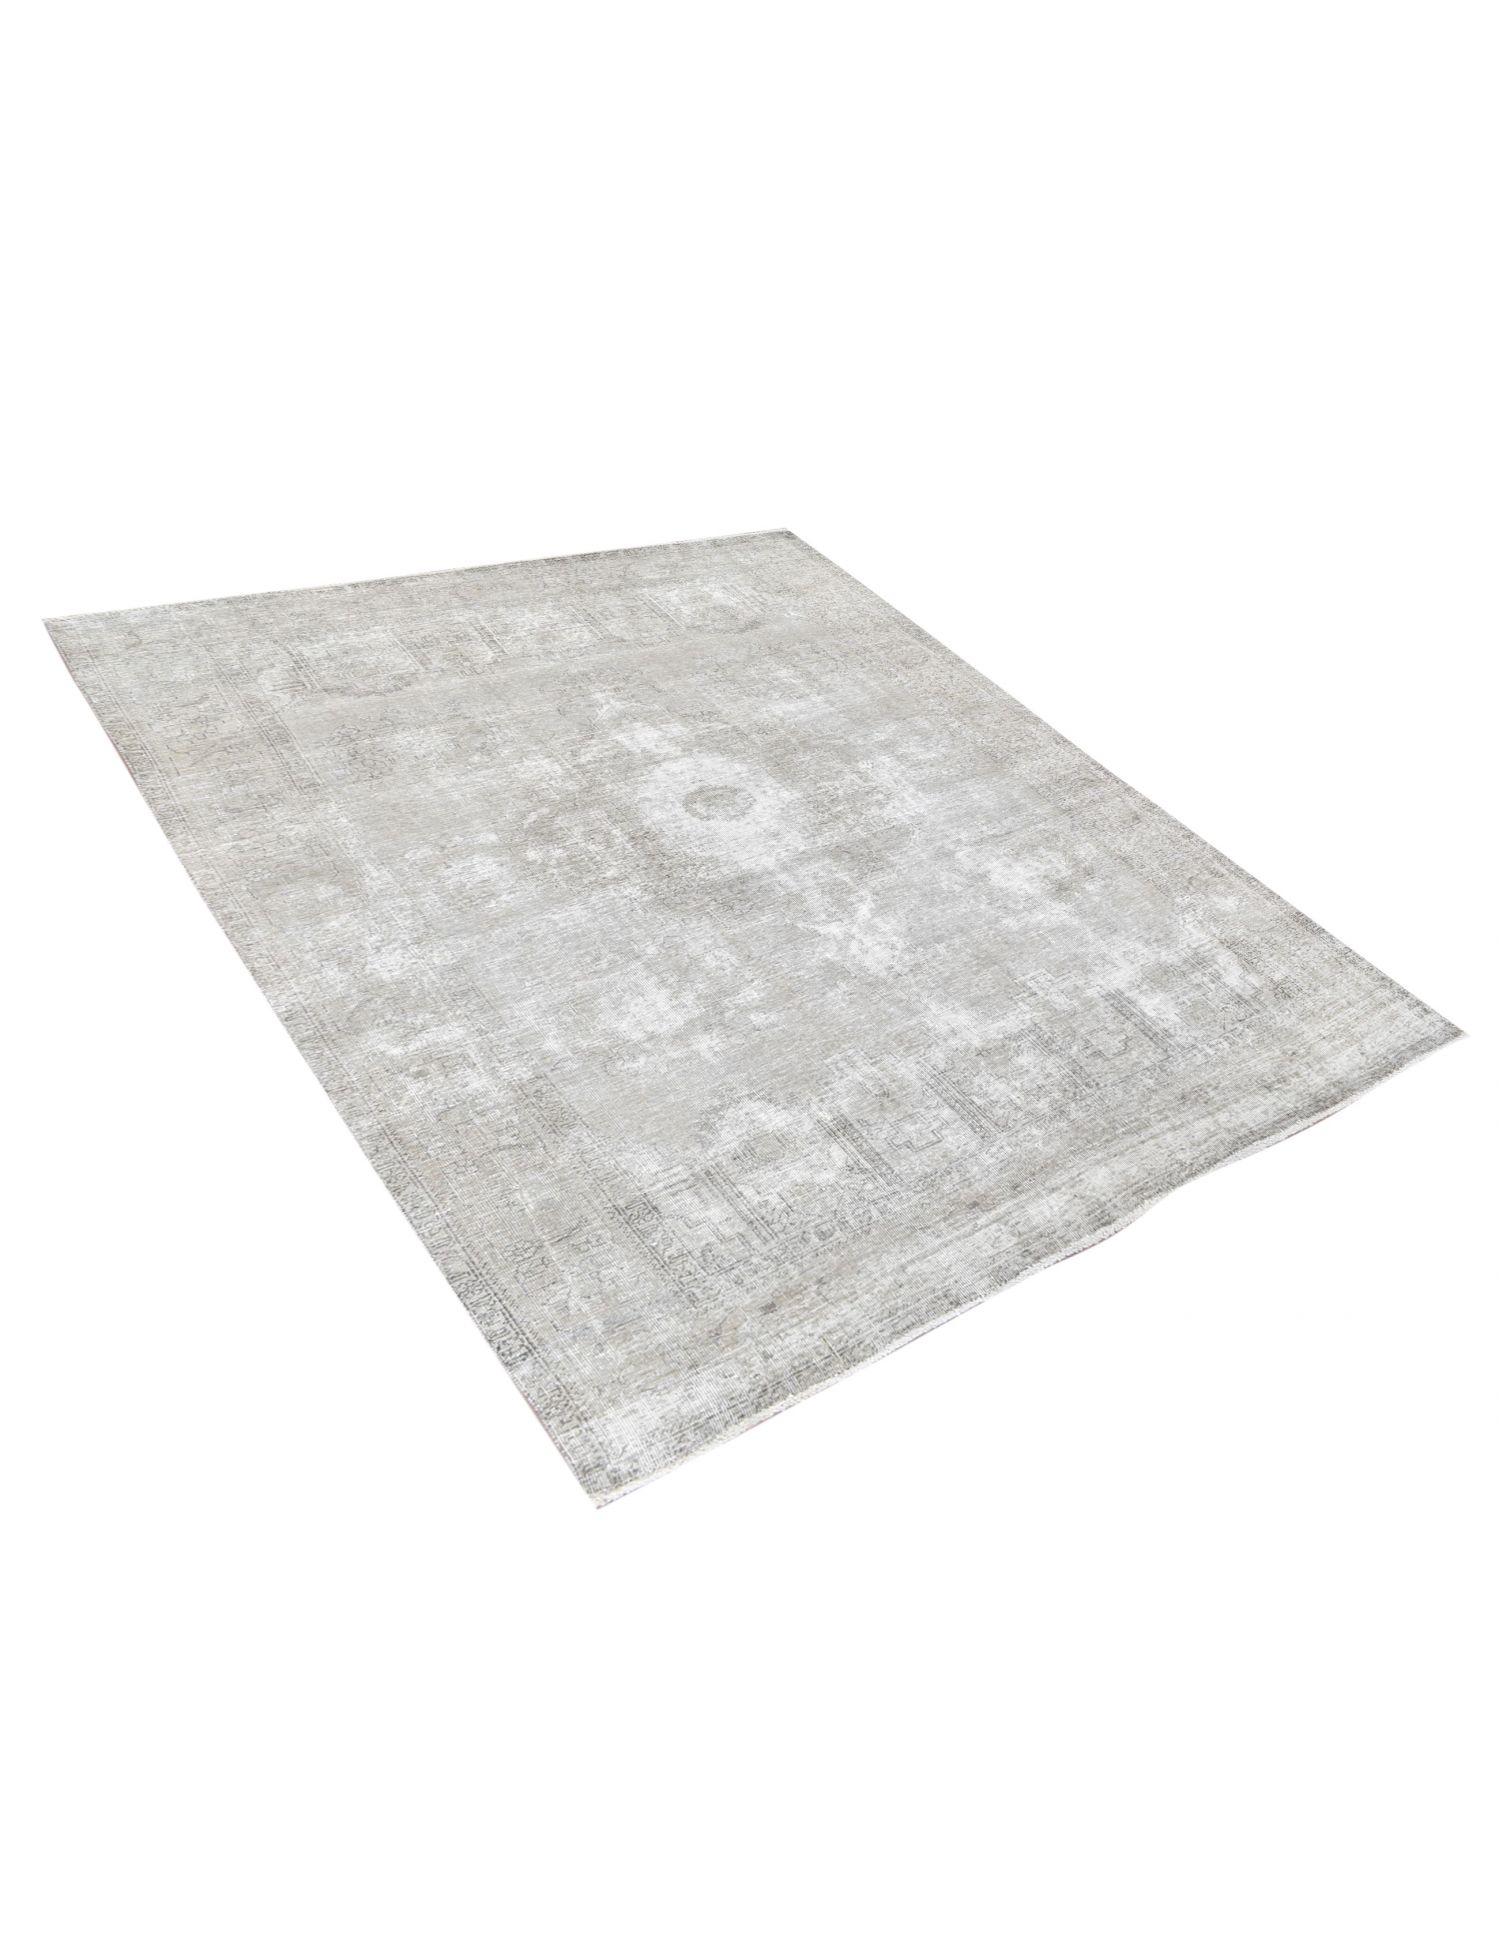 Vintage Teppich  grau <br/>285 x 198 cm